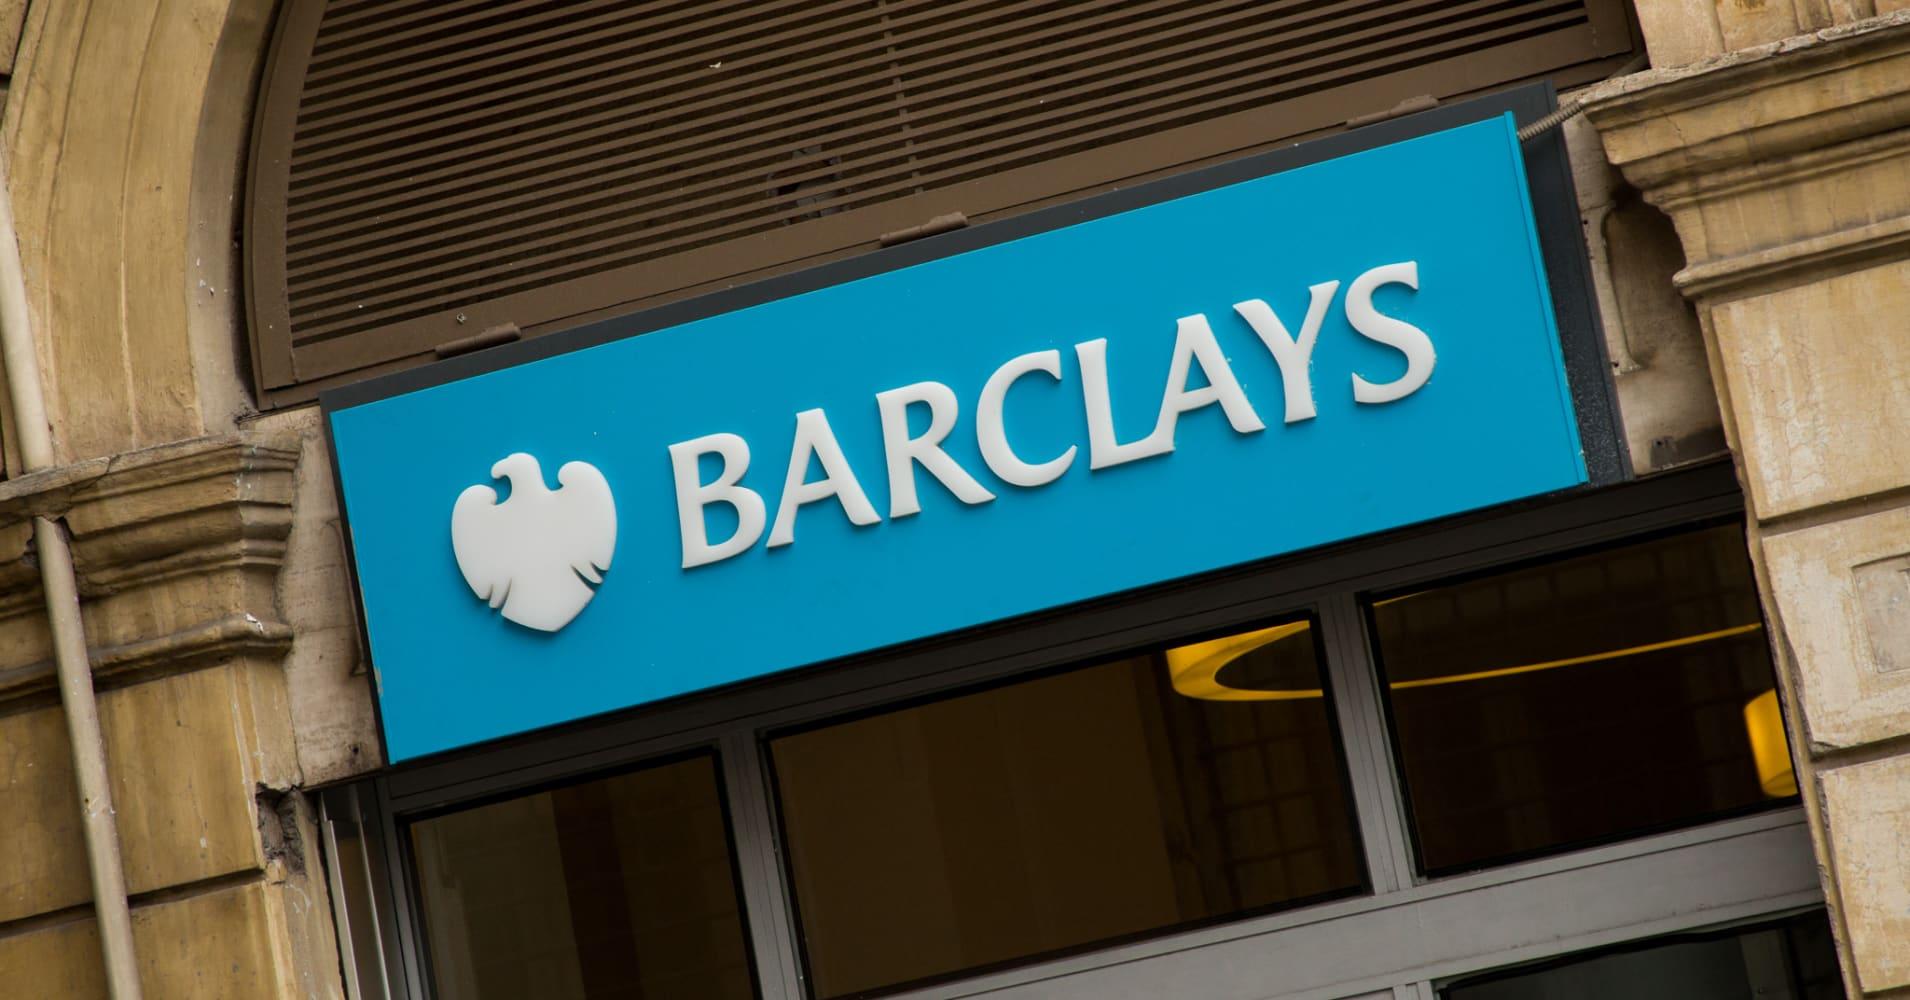 Business Plan Barclays